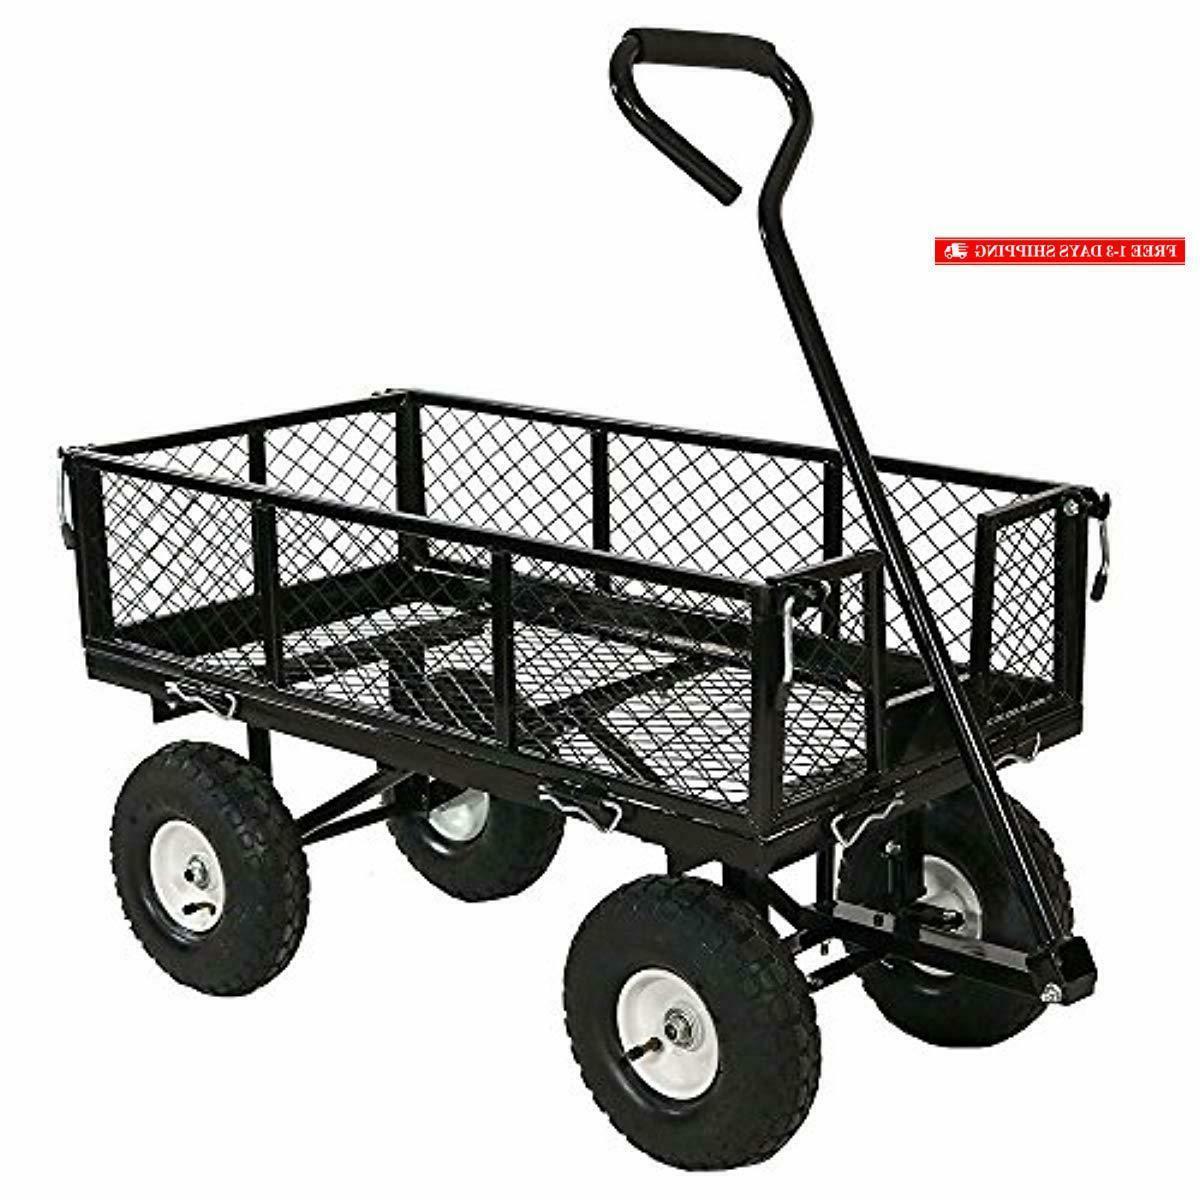 sunnydaze utility steel garden cart outdoor lawn